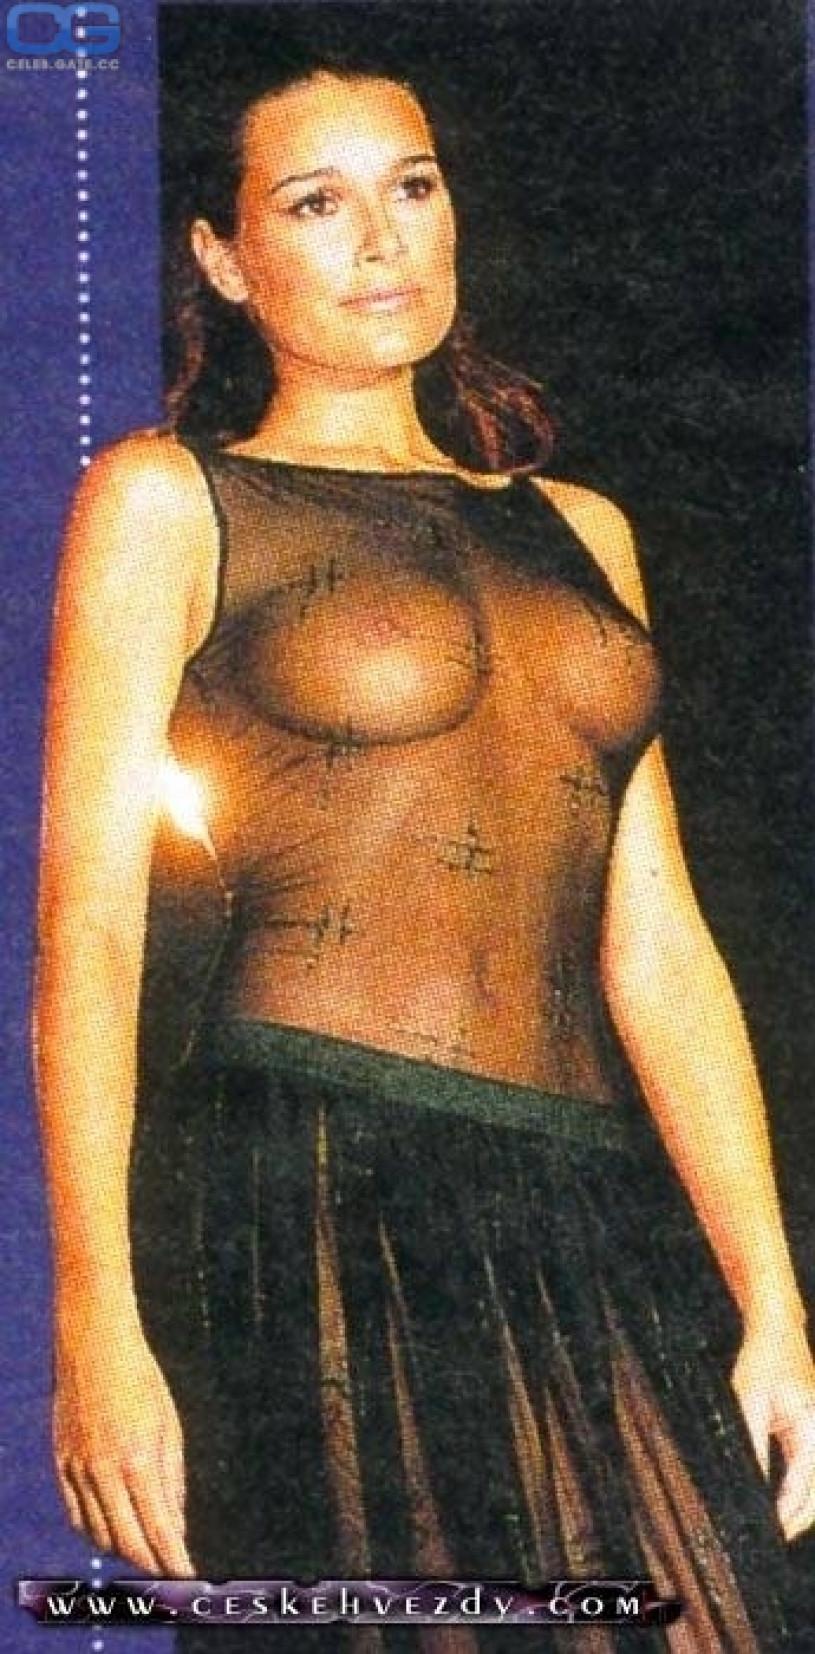 Alena seredova sexy pussy, marathi young girls nude photo